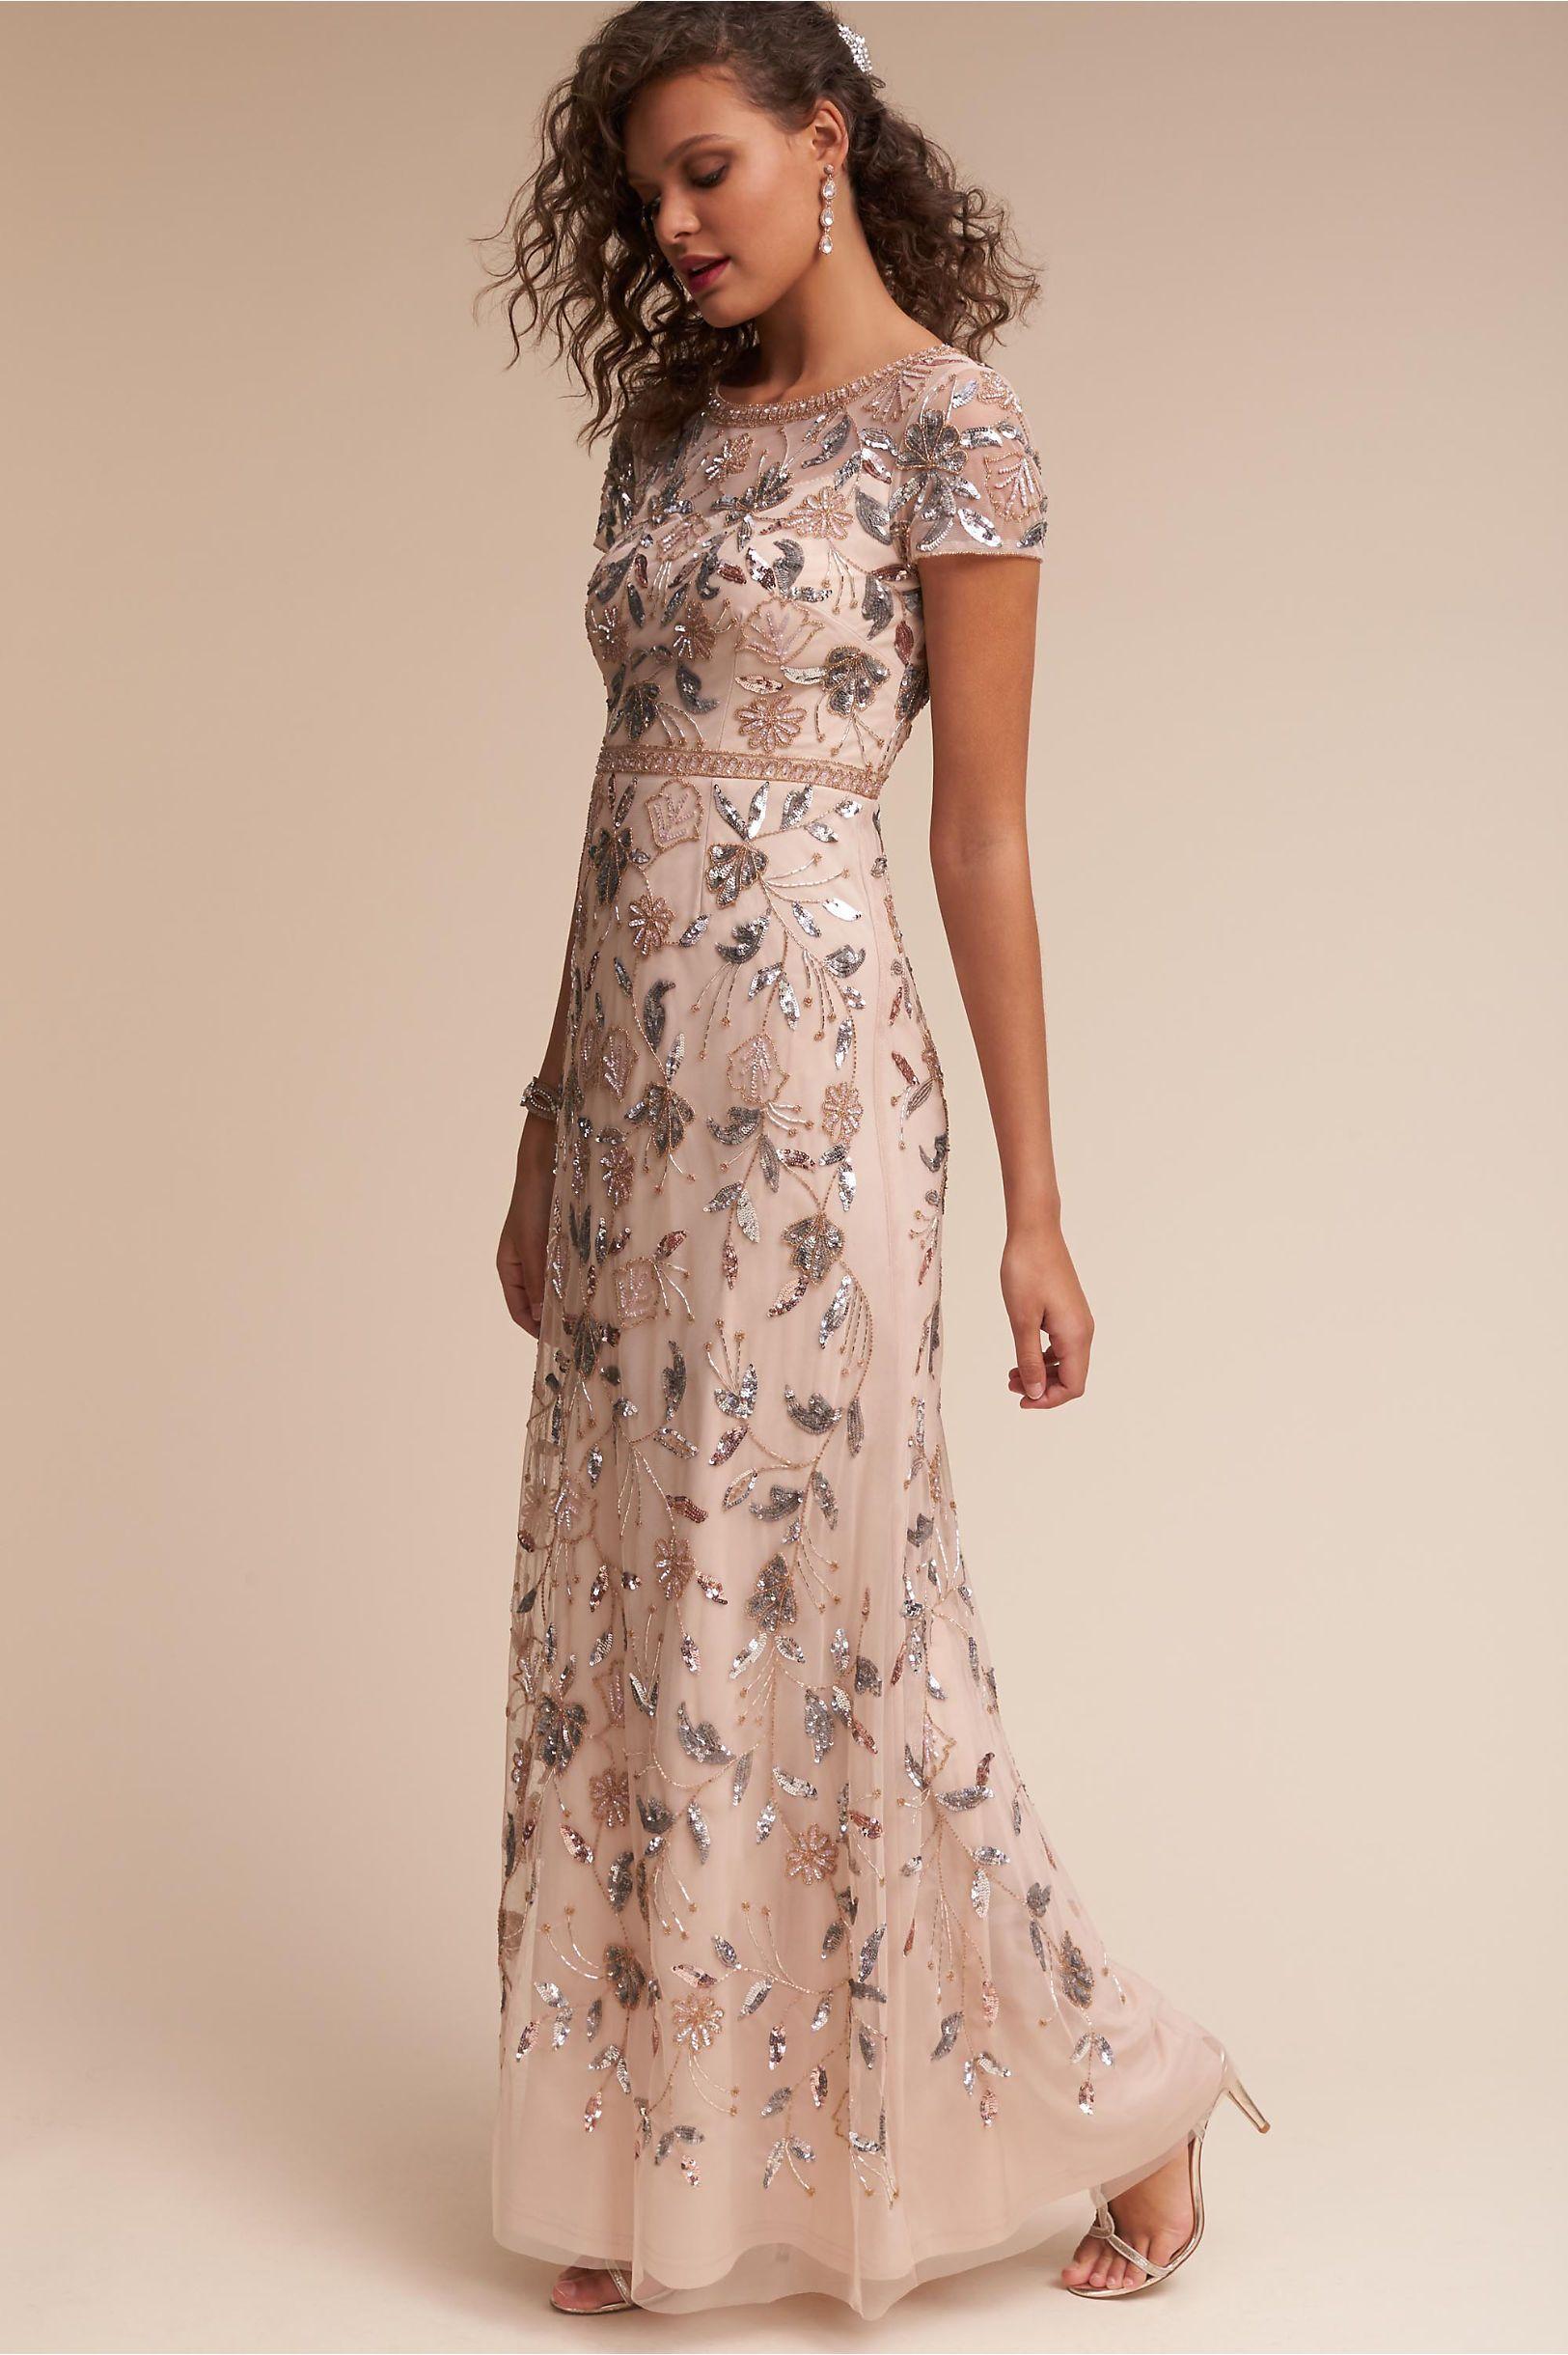 BHLDN Cecelia Dress in Bride Reception & Rehearsal Dresses | BHLDN ...